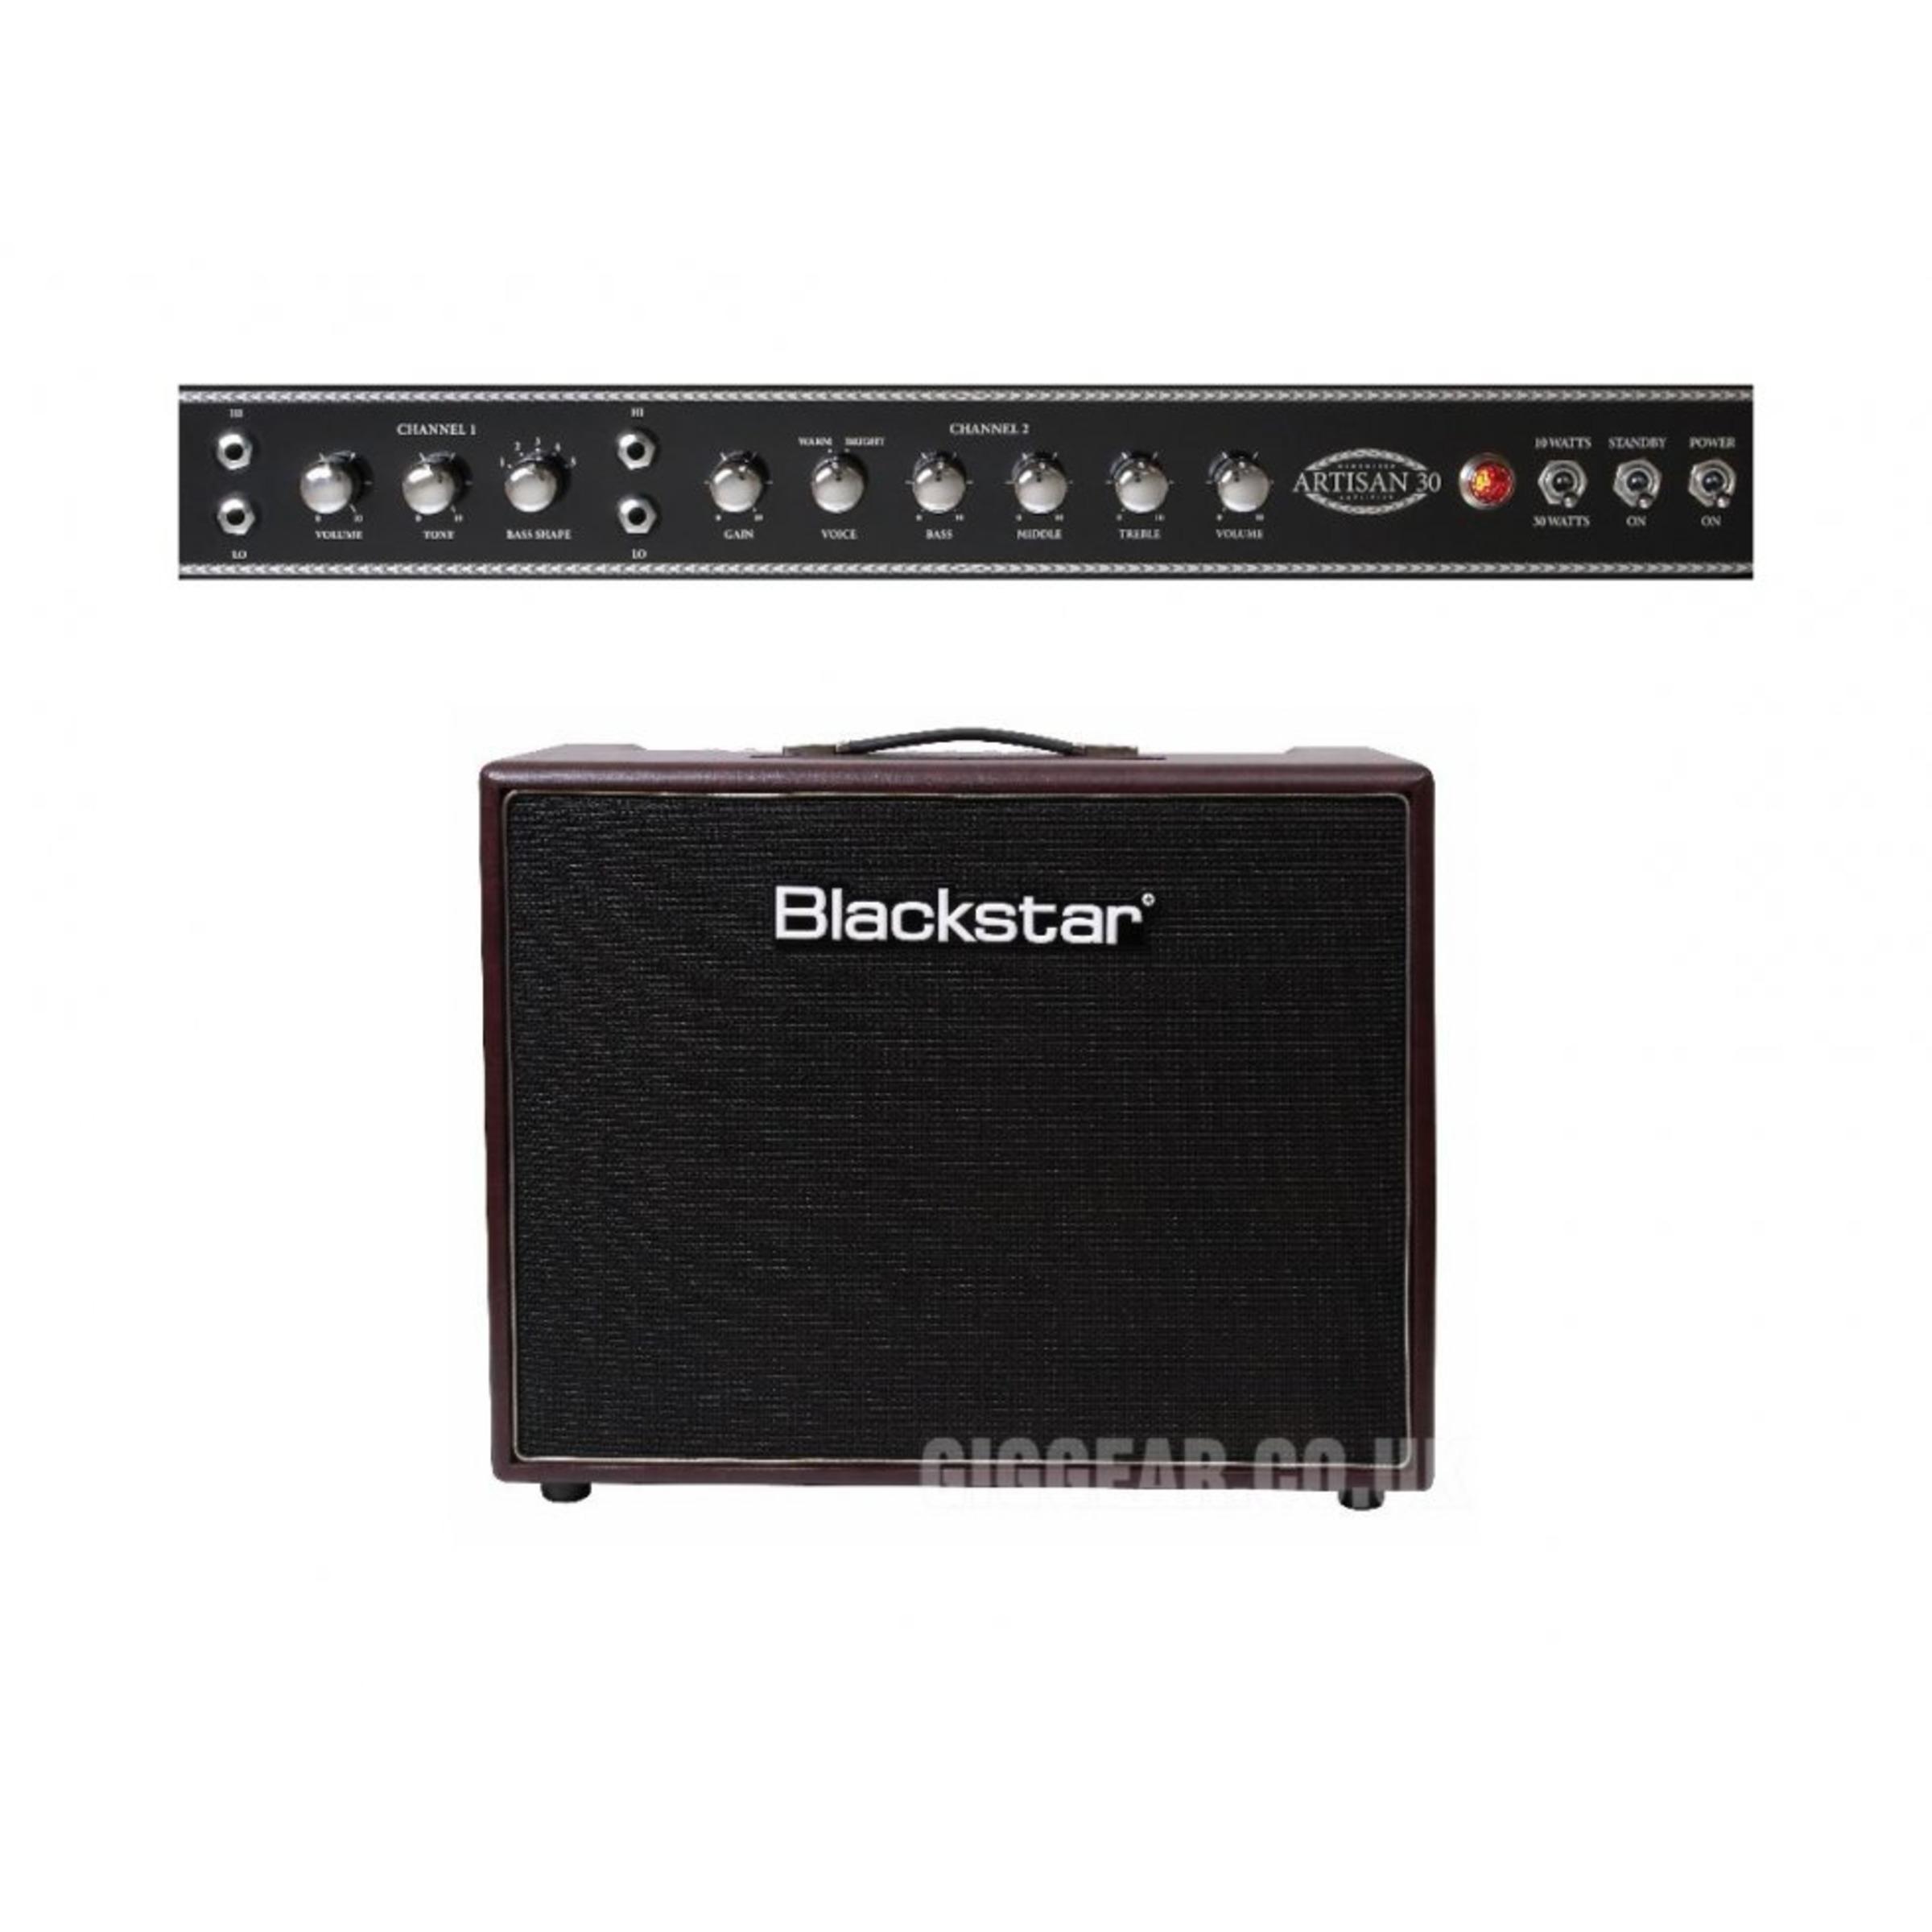 blackstar artisan 30 hand wired guitar valve combo giggear. Black Bedroom Furniture Sets. Home Design Ideas